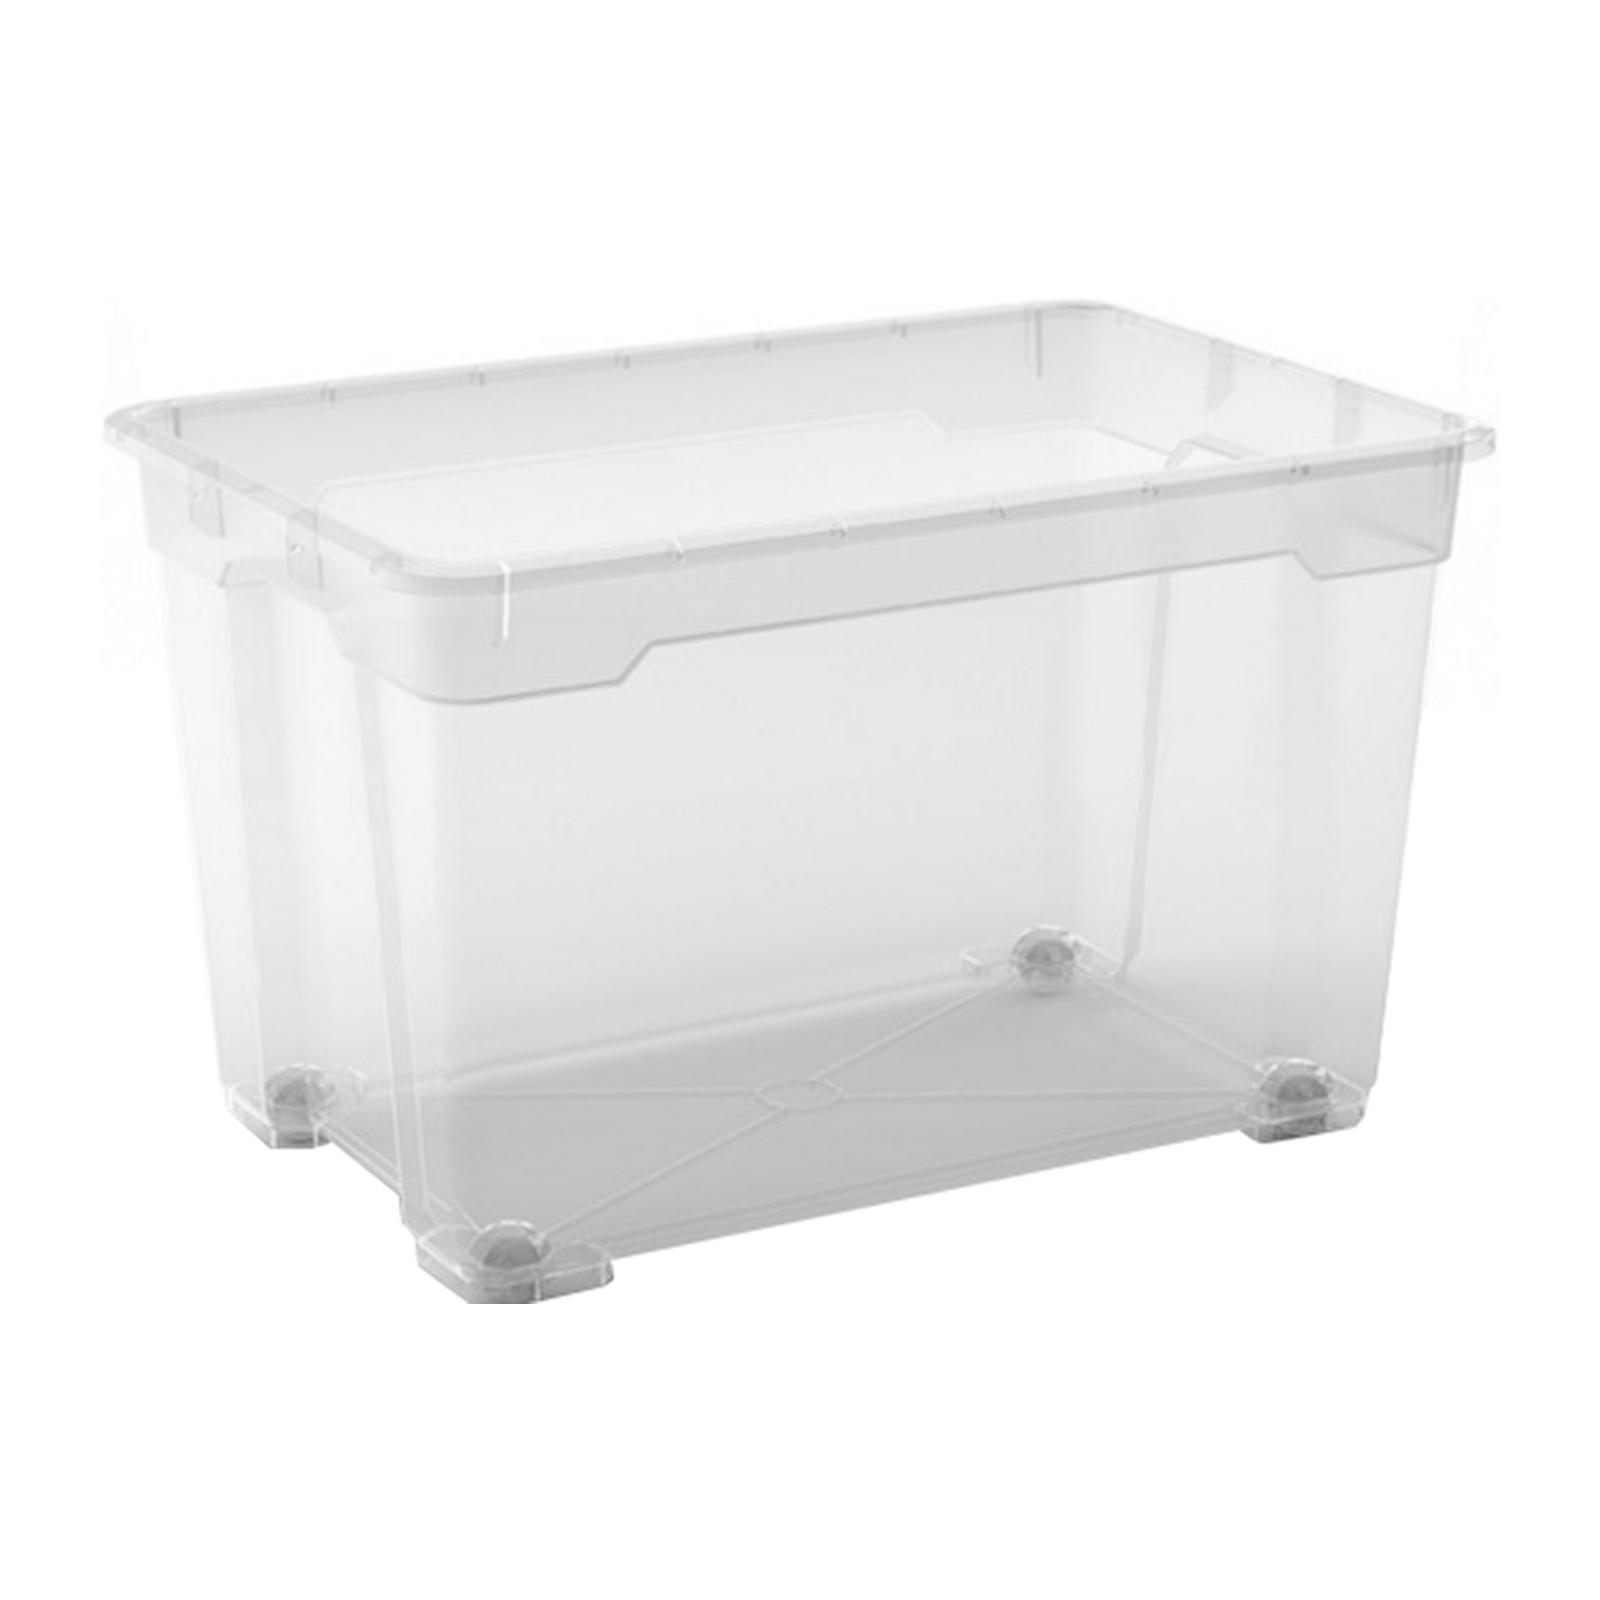 KIS Clear Storage R Box XL With Lid